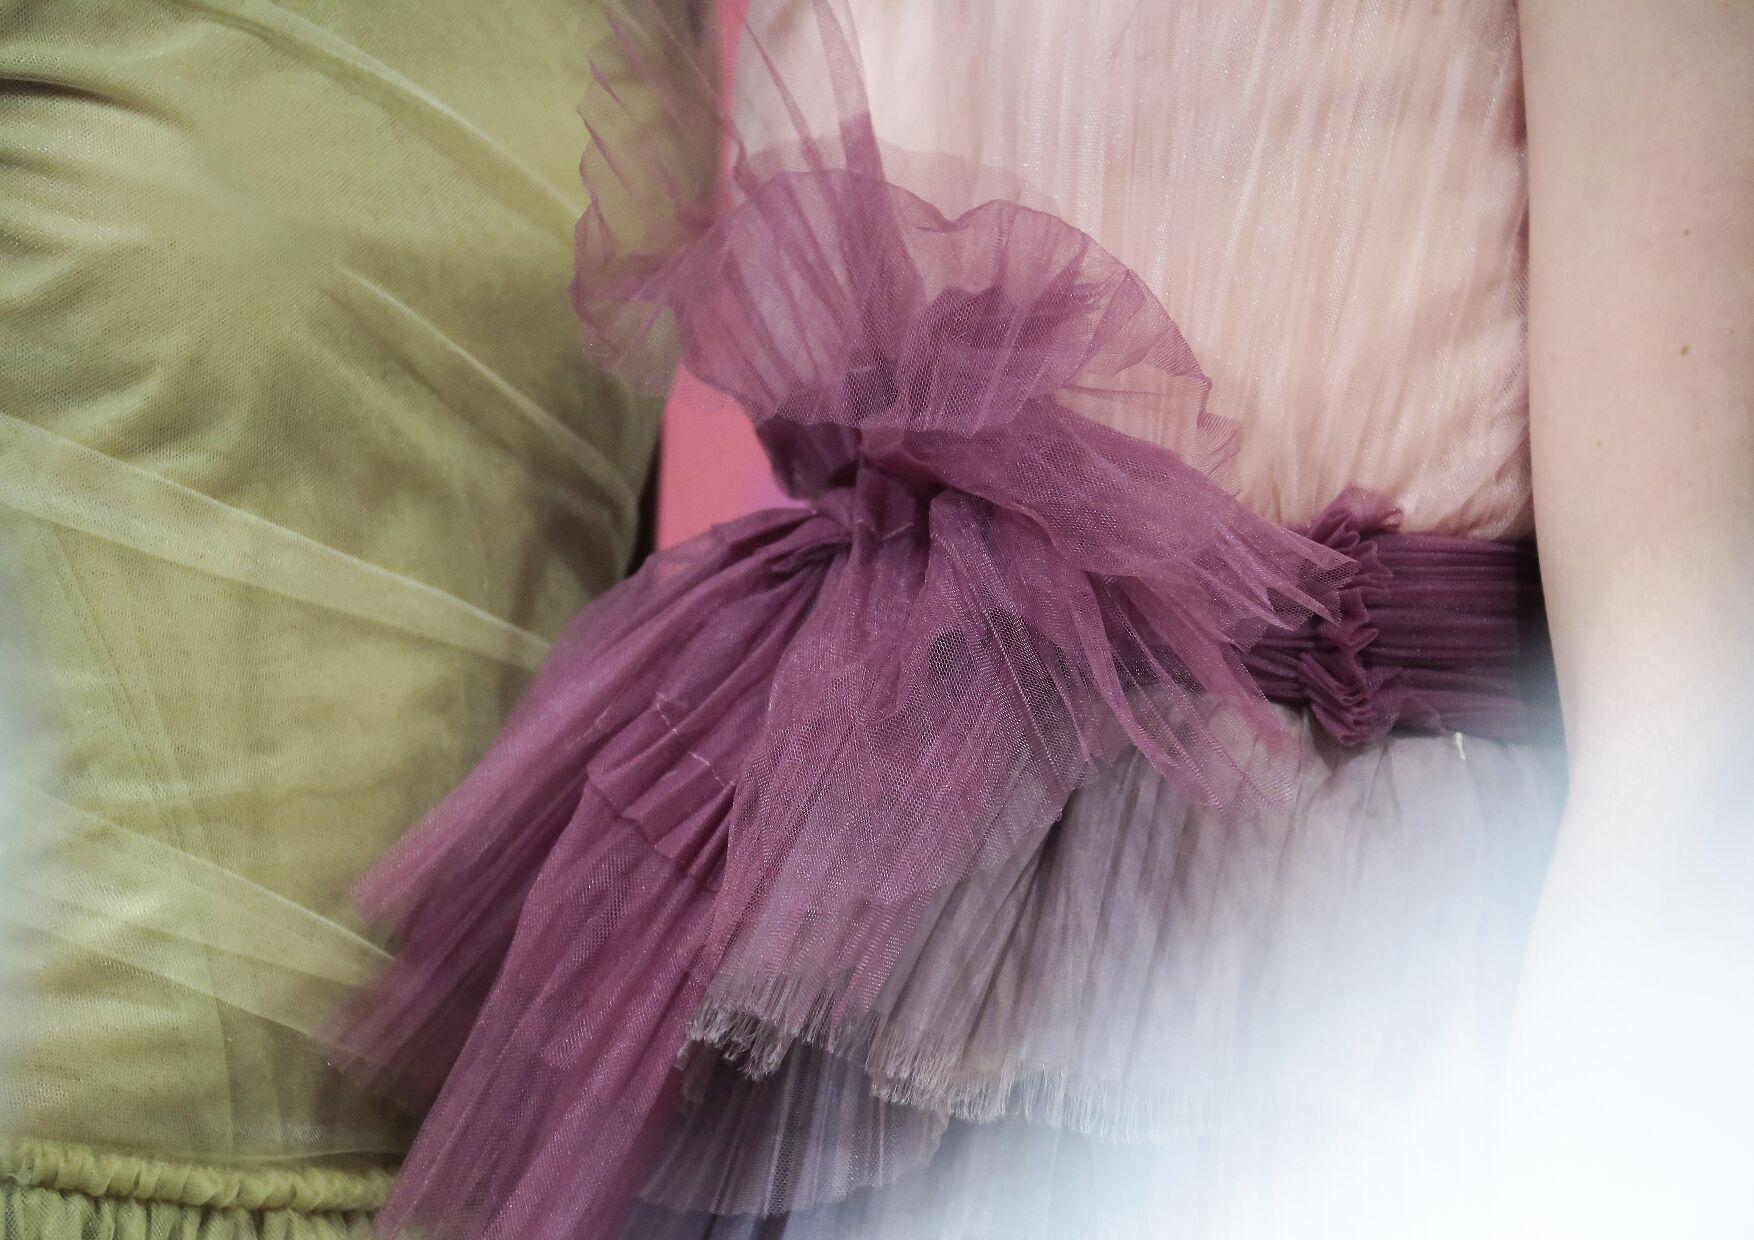 Backstage Burberry Prorsum Dress Detail